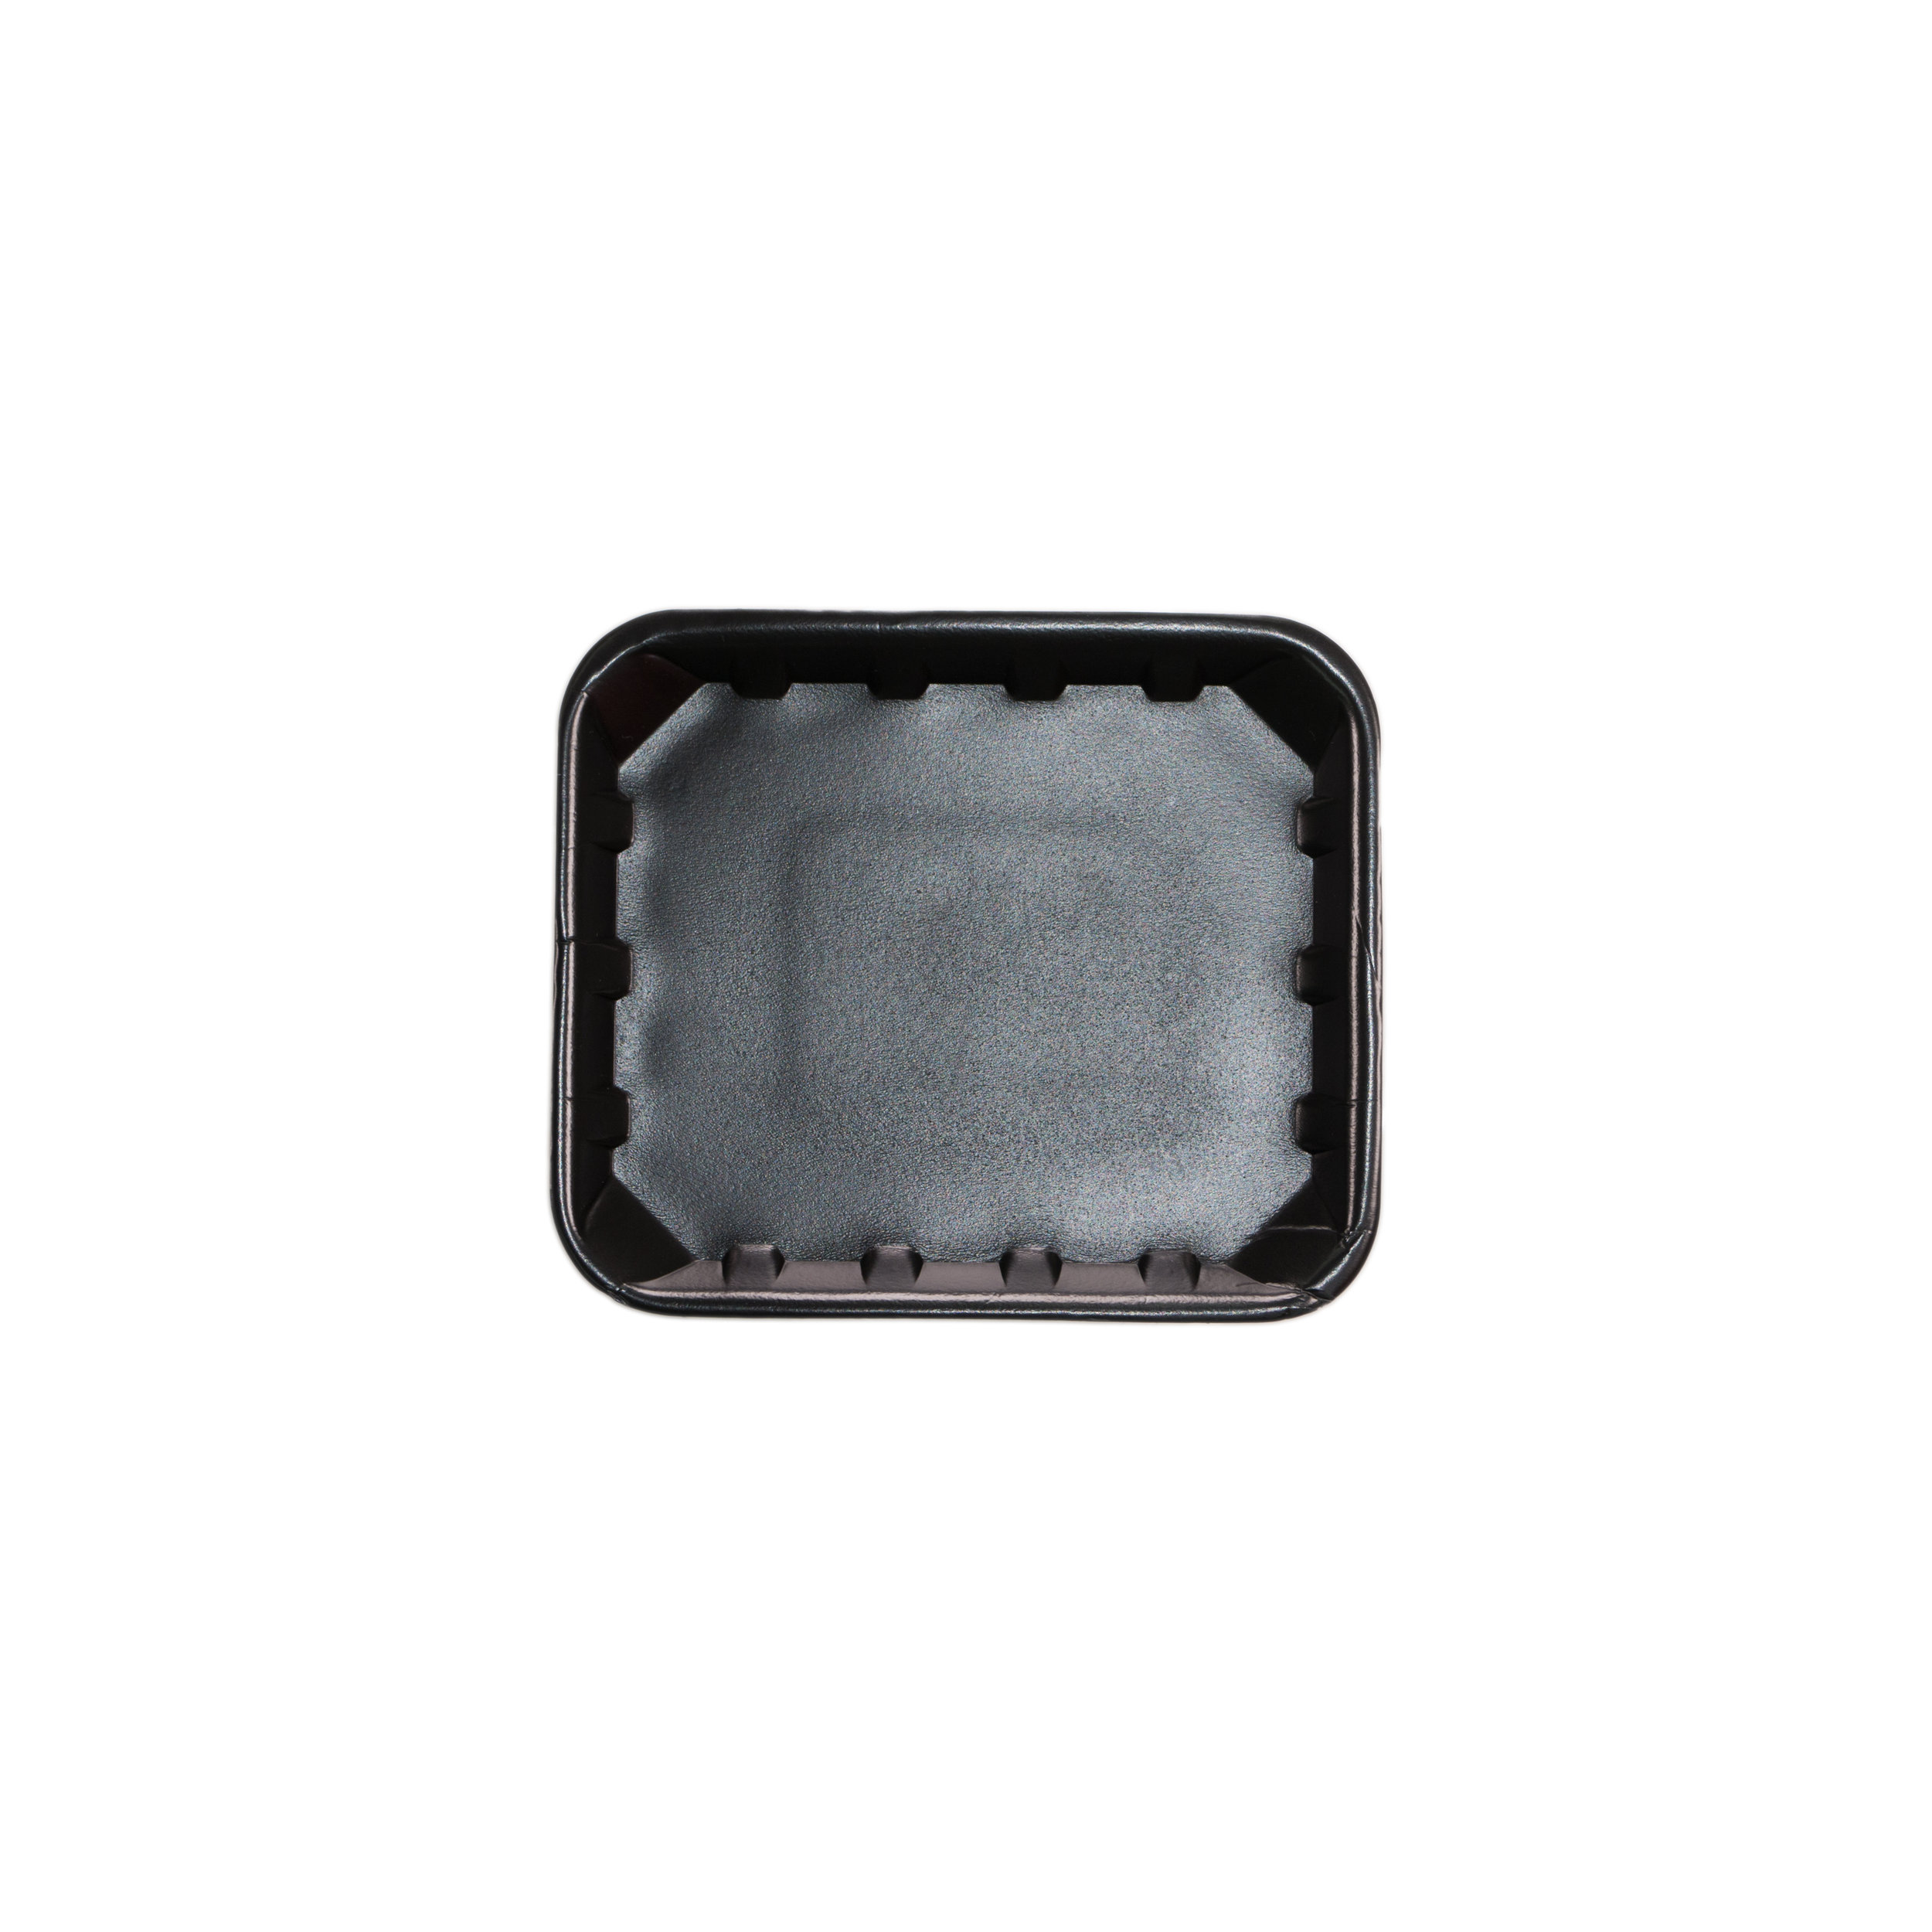 iK0317      CLOSED CELL SHALLOW 6x5    125 per sleeve 1000 per carton